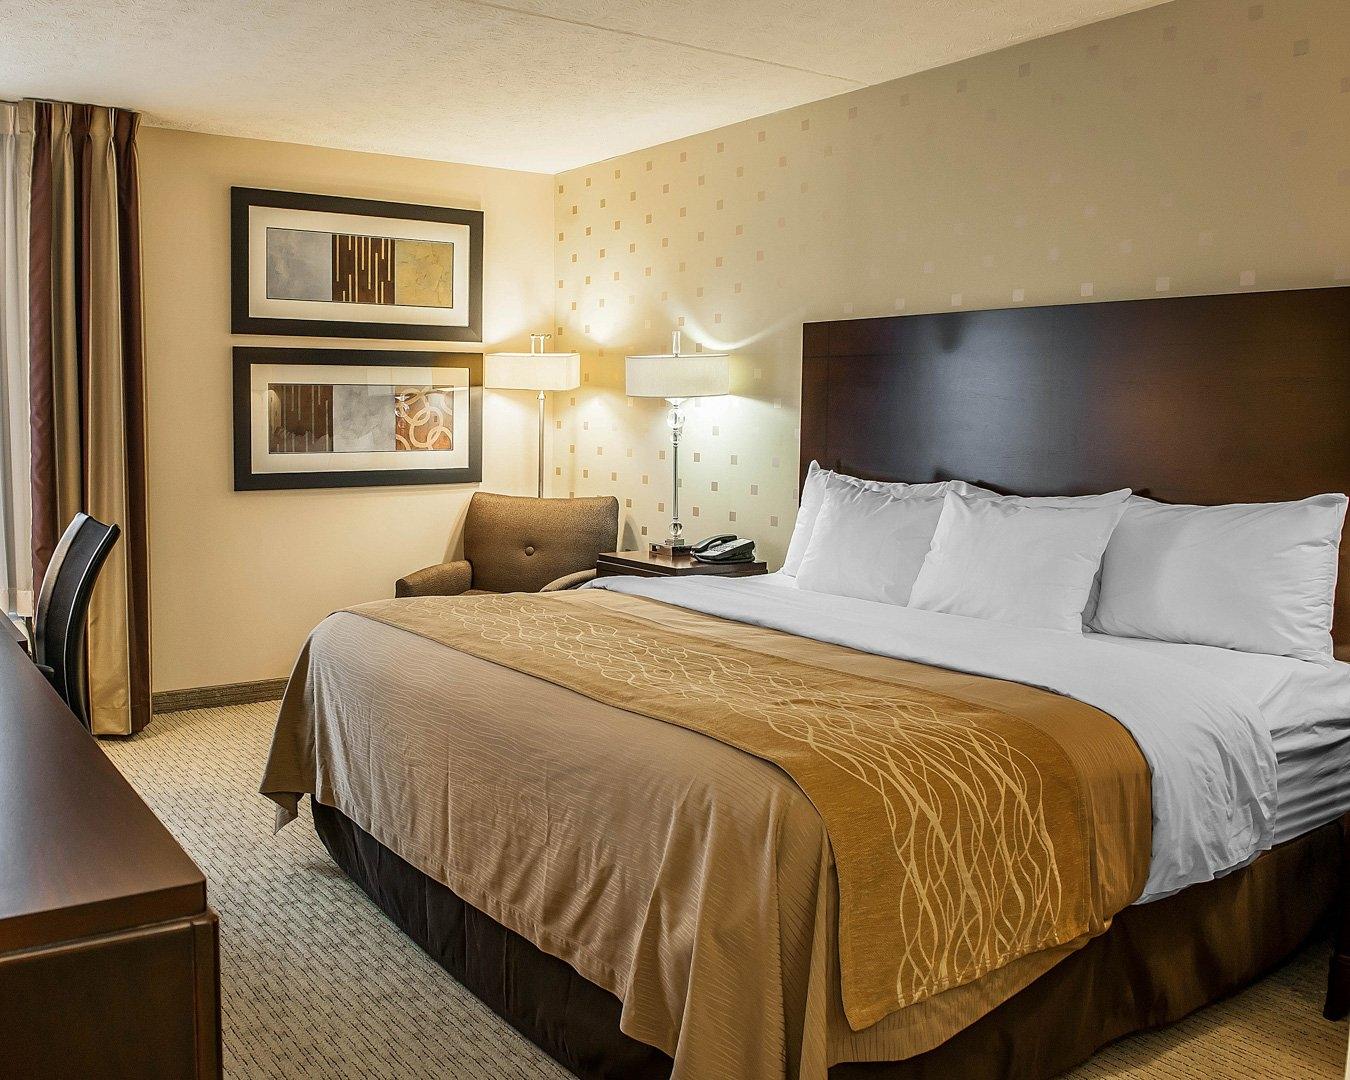 comfort inn in bloomington in whitepages